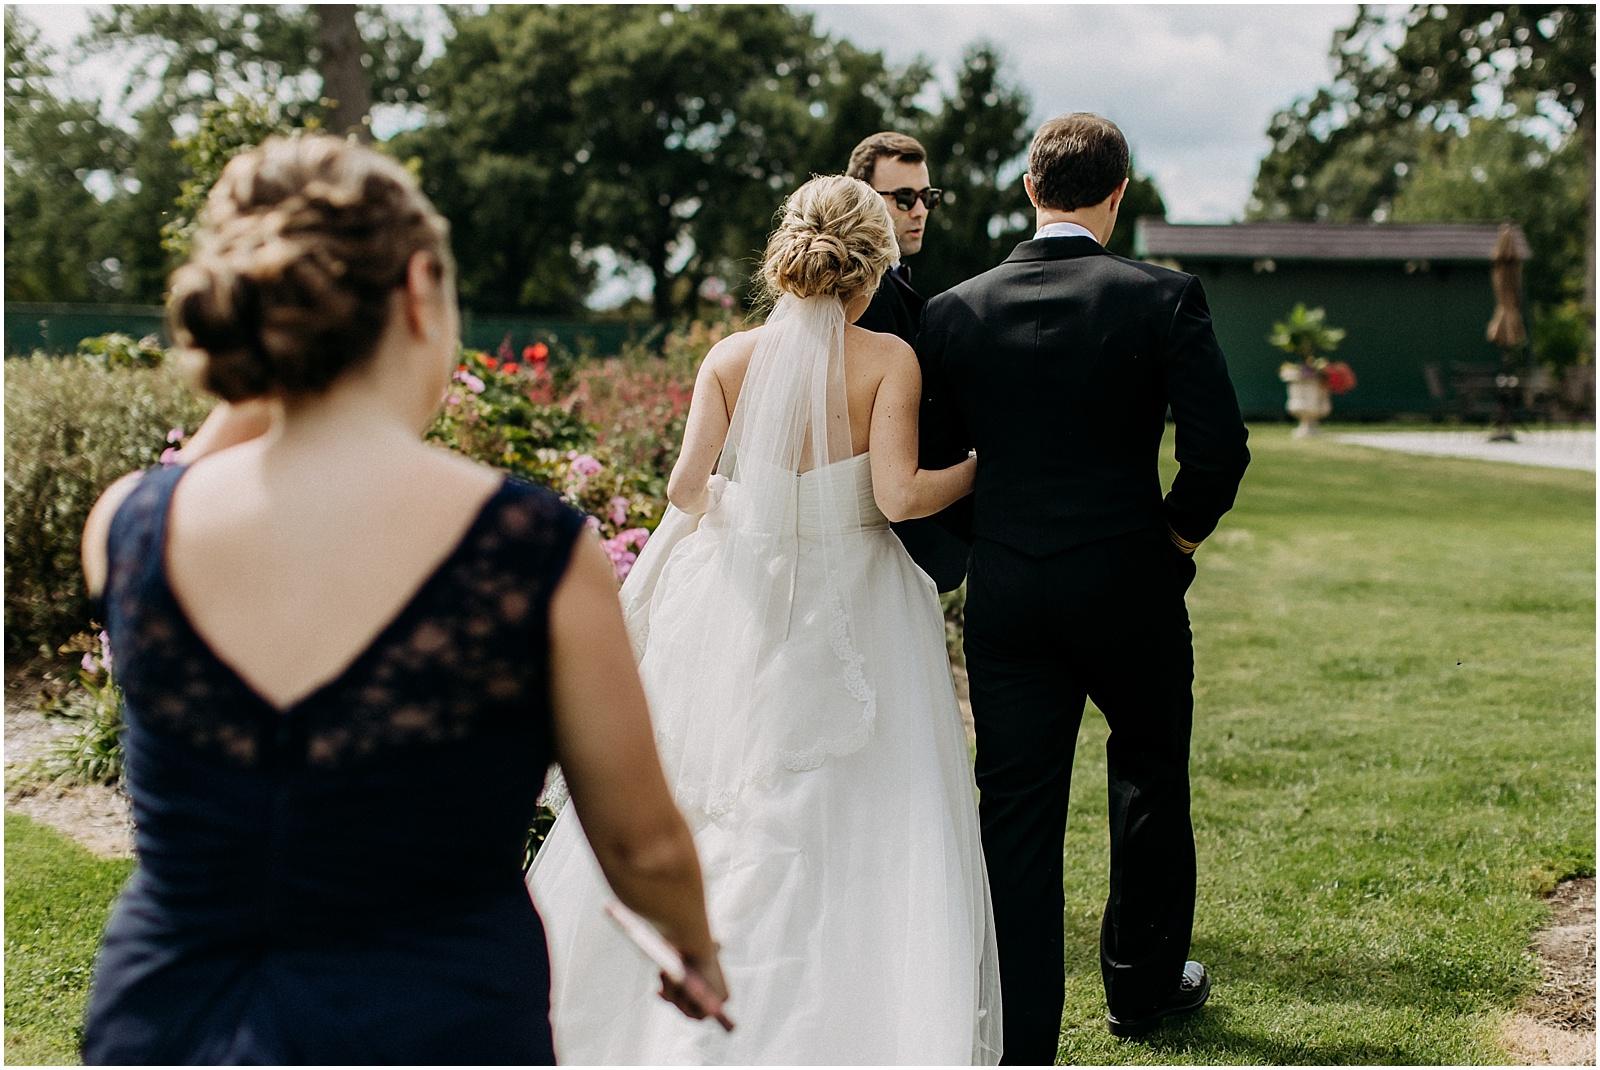 glen_echo_st_louis_mo_wedding_0053.jpg